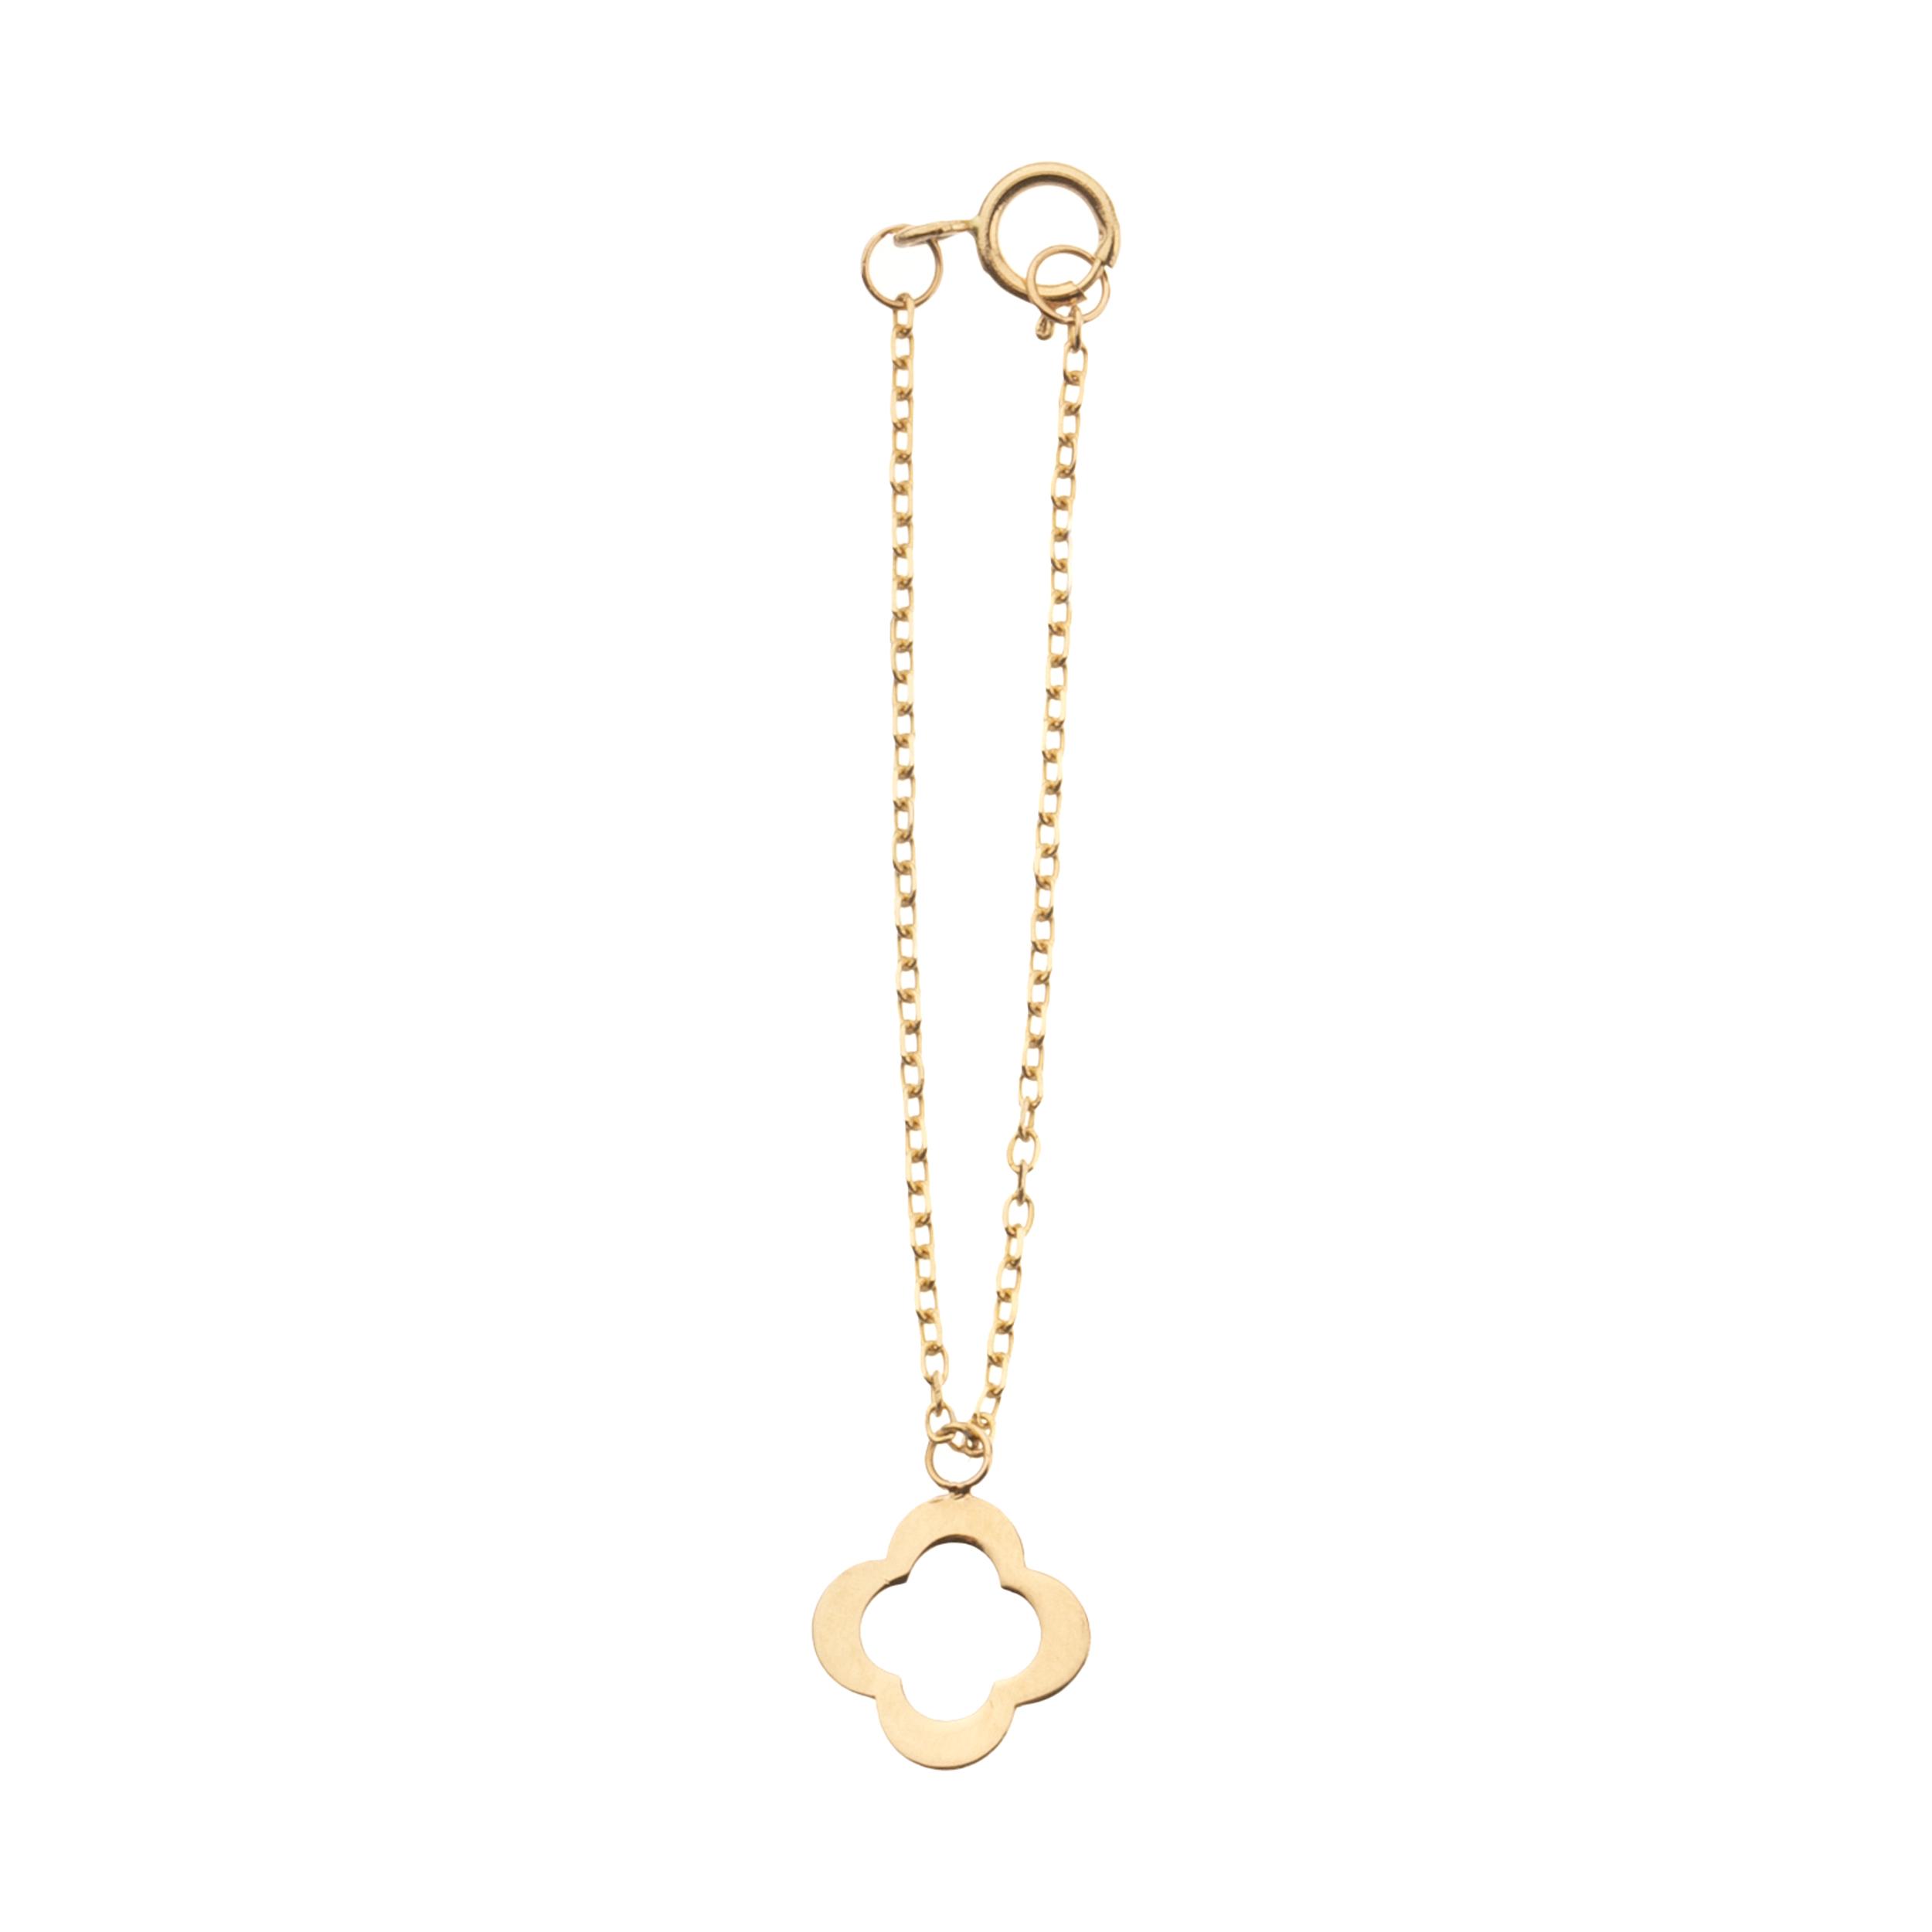 آویز ساعت طلا 18 عیار زنانه ناتروسا مدل NG204